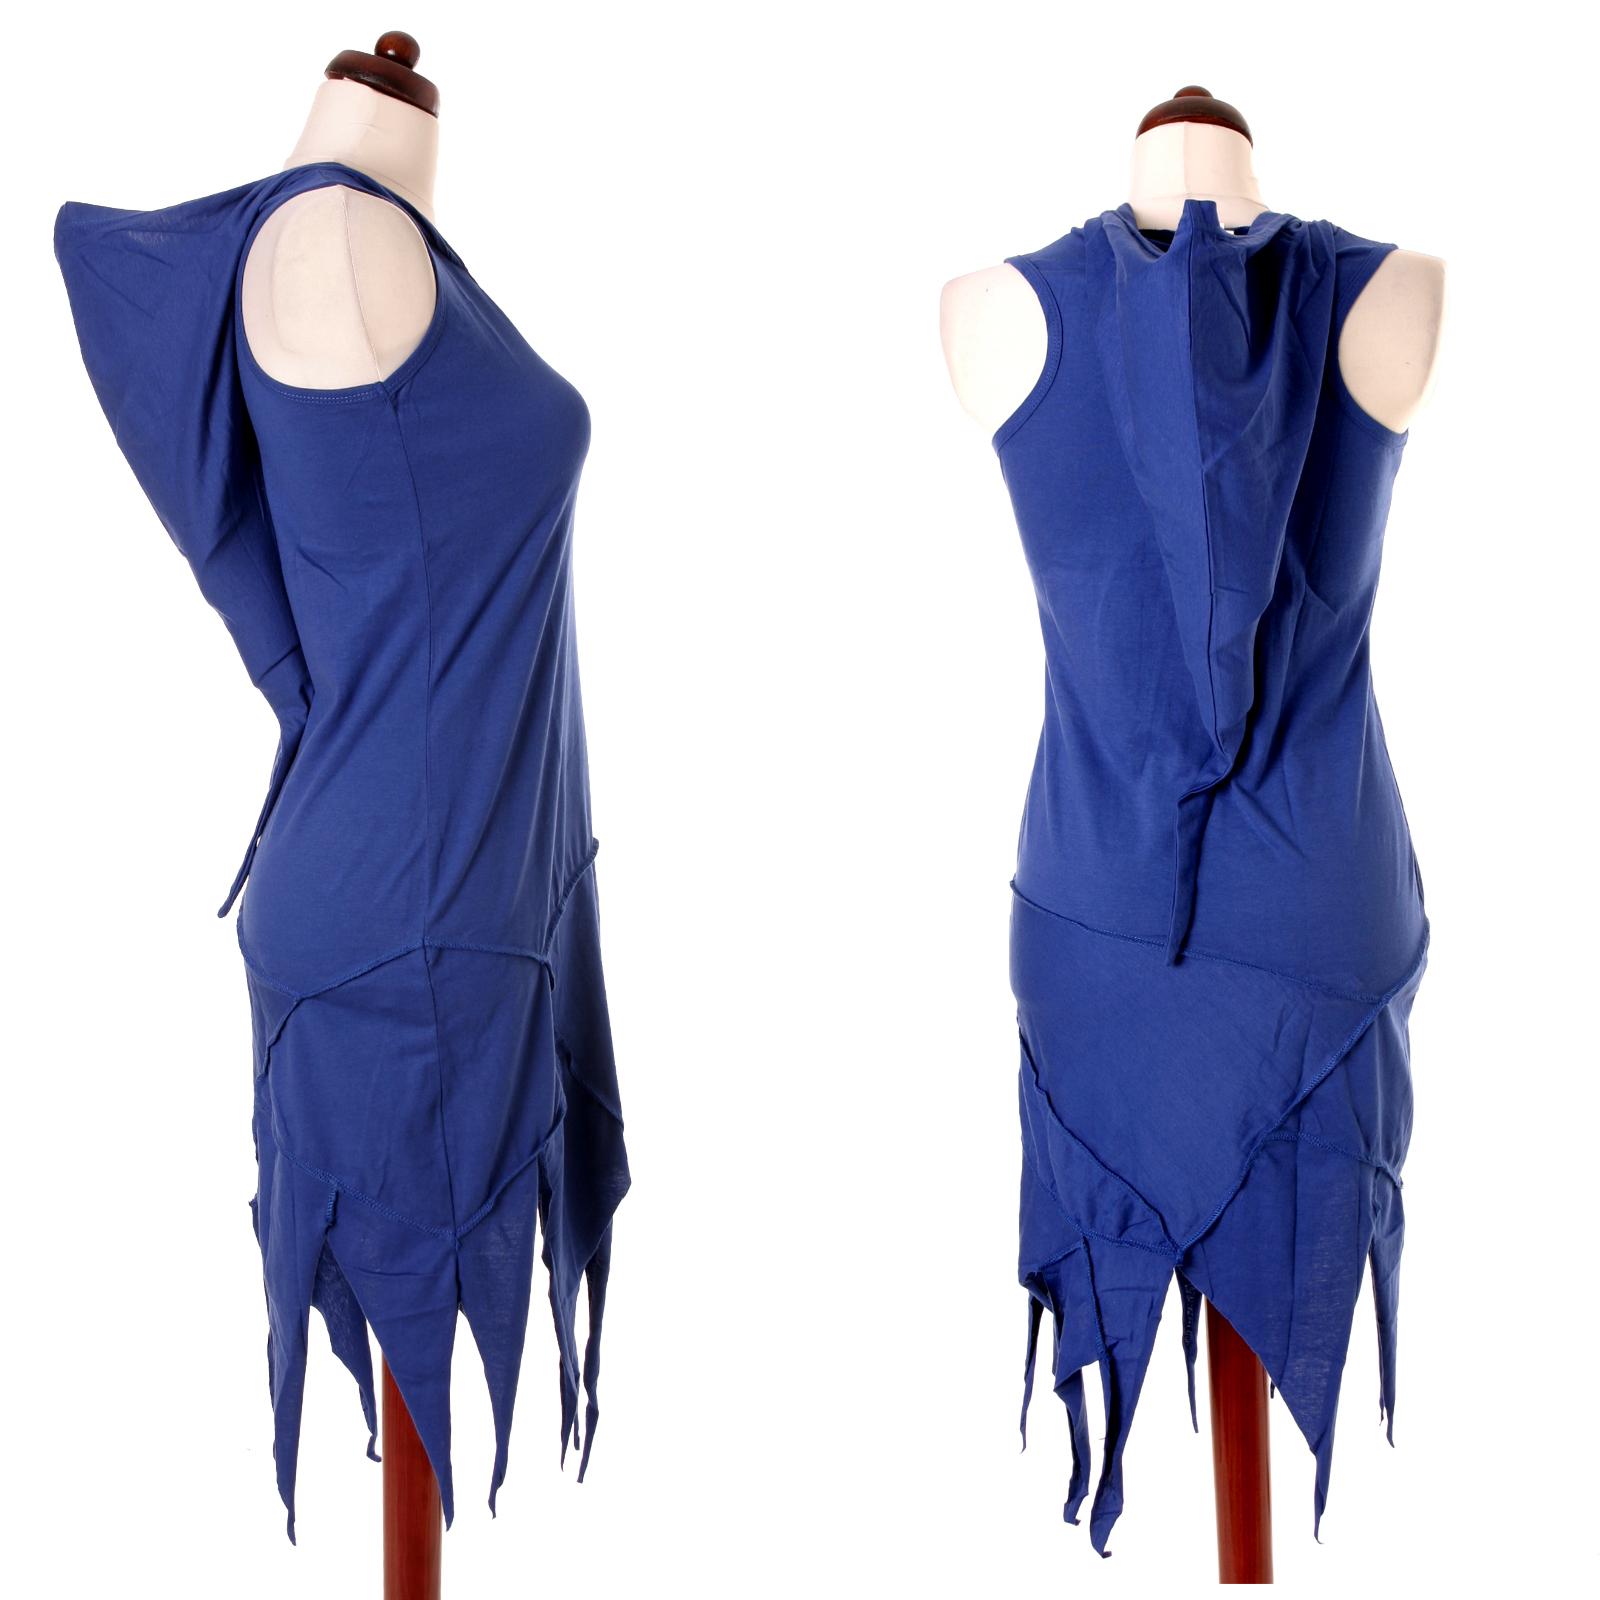 Vishes Goa Kleid Zipfelkapuze Hoodie Dress Kapuzenkleid Strandkleid Hippie Larp   eBay